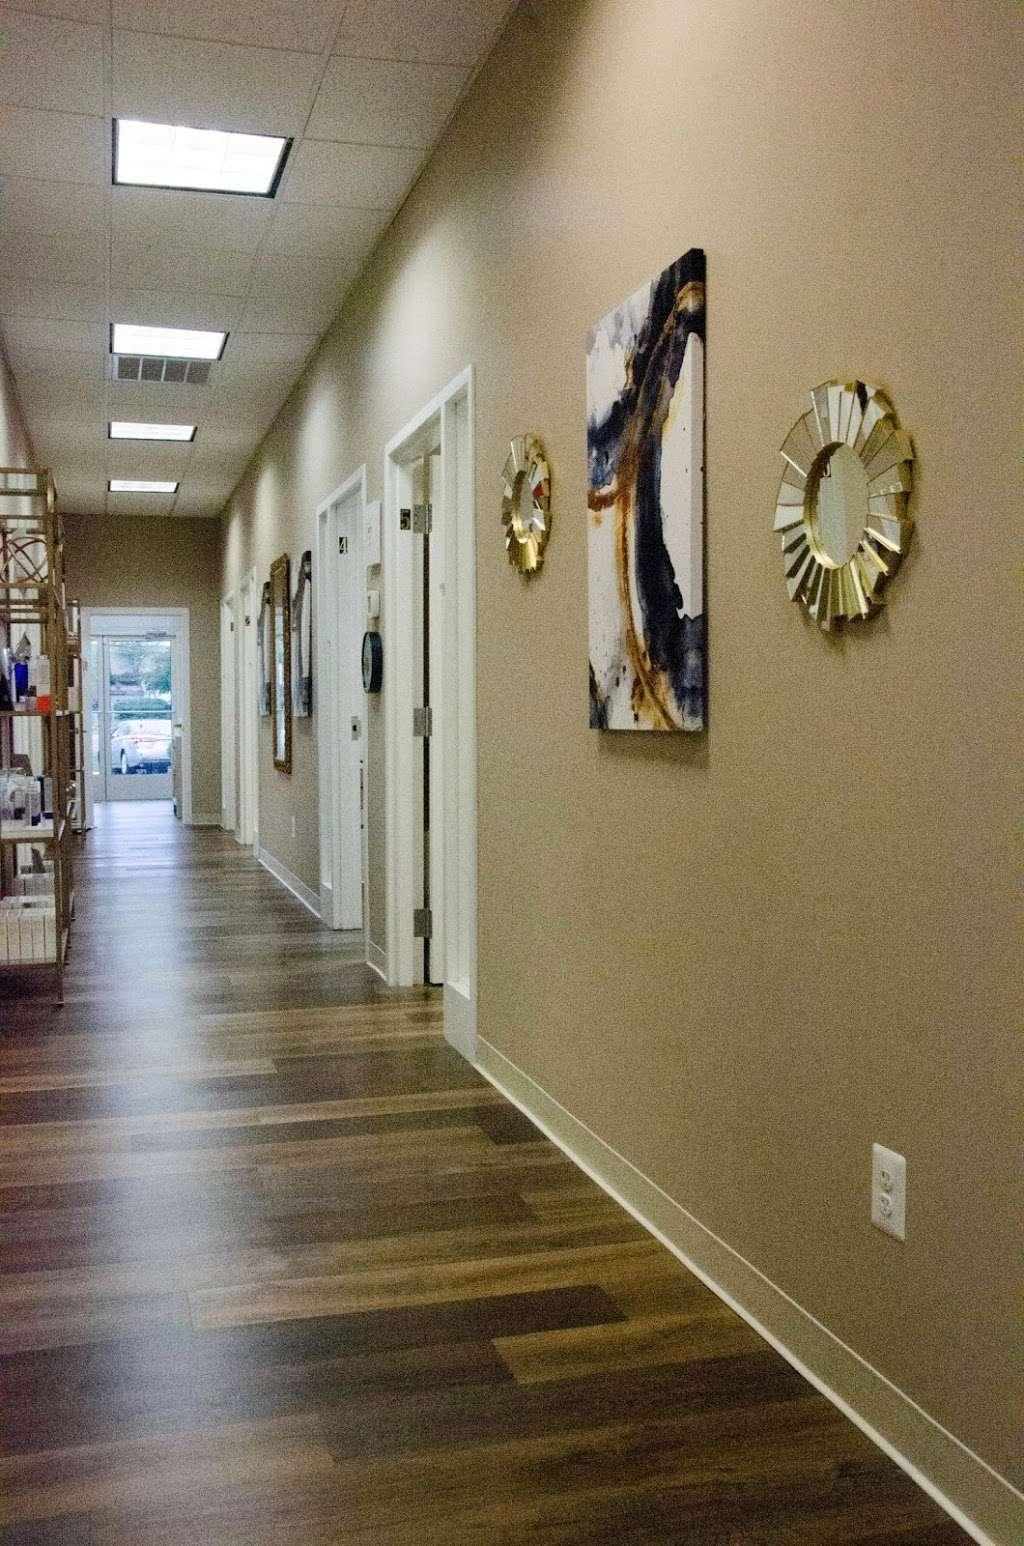 Ageless Aesthetics MD - spa  | Photo 7 of 10 | Address: 3447 Fall Hill Ave, Fredericksburg, VA 22401, USA | Phone: (540) 645-2472